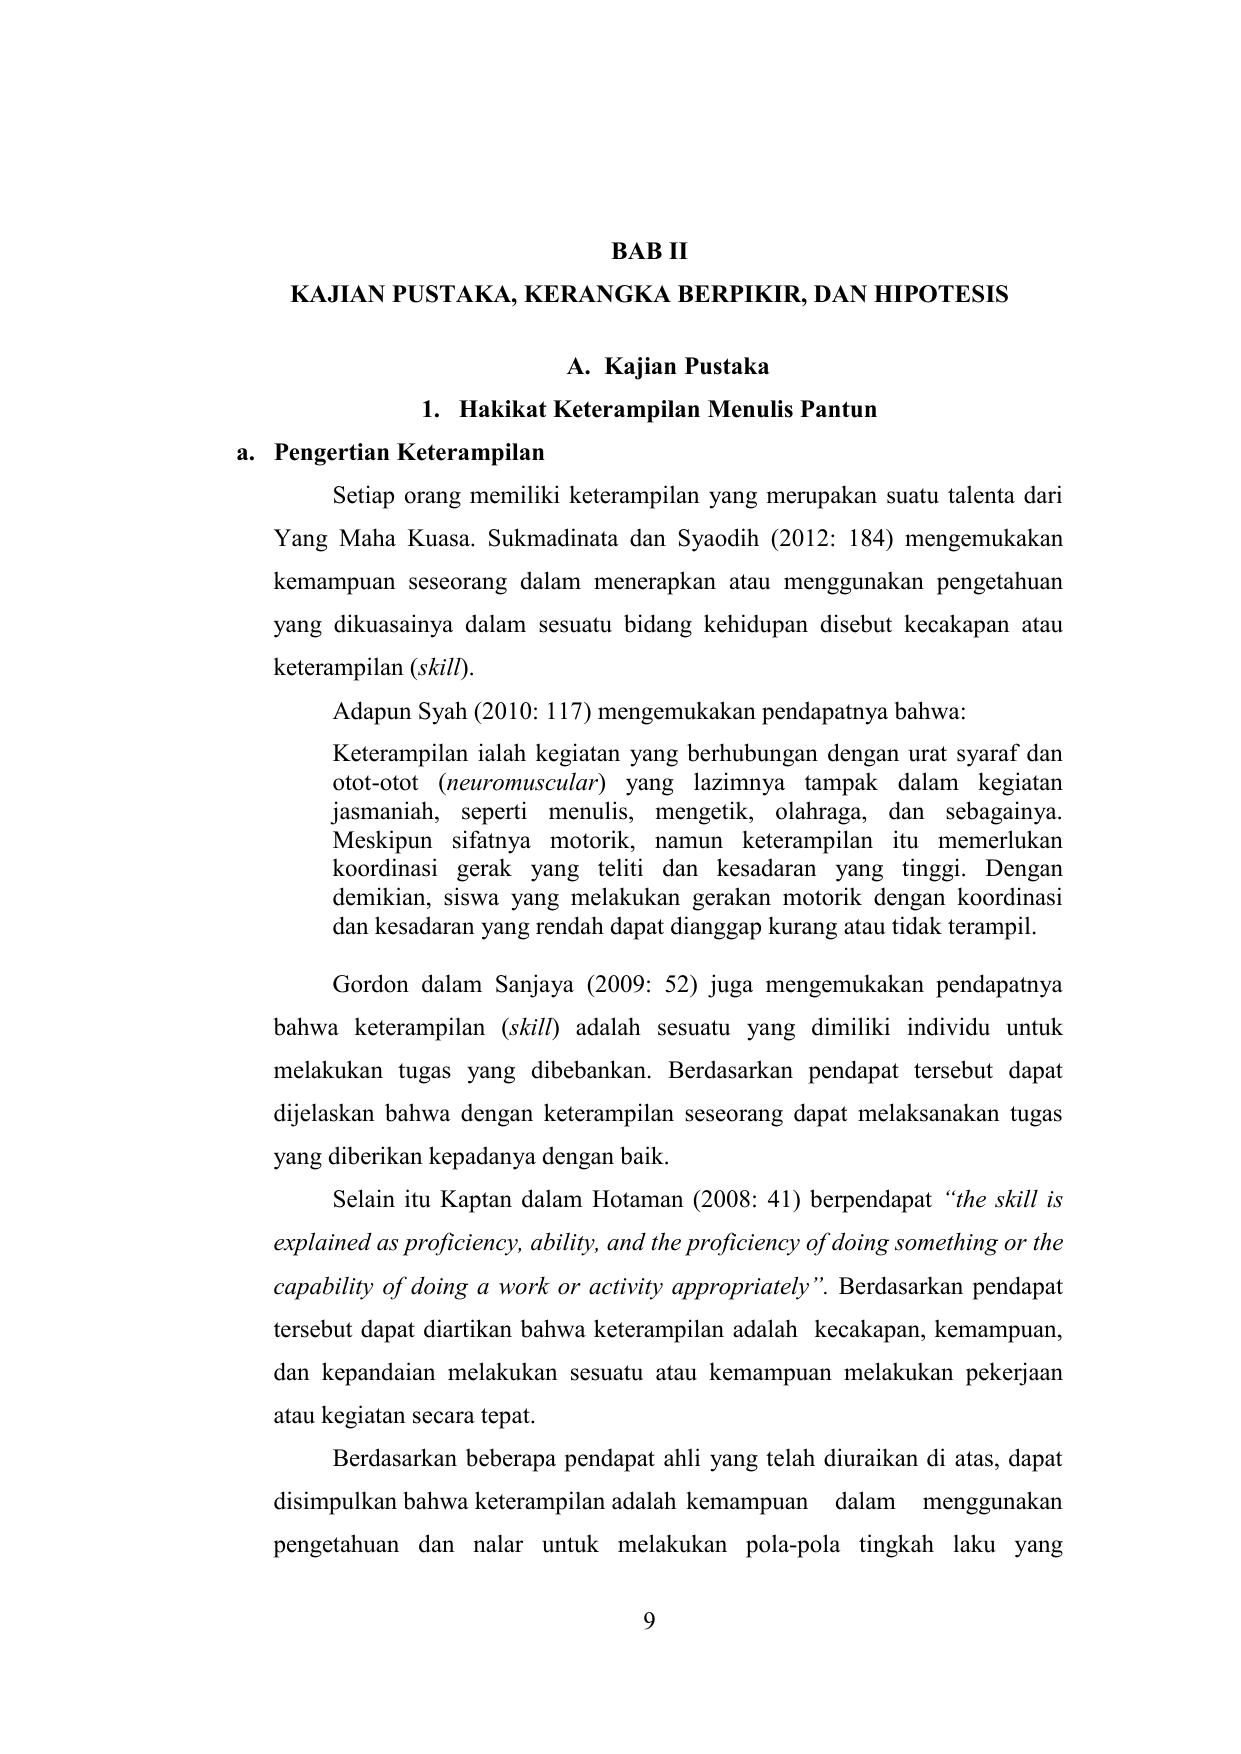 Silabus Bahasa Indonesia Kelas 1 Sd Semester 2